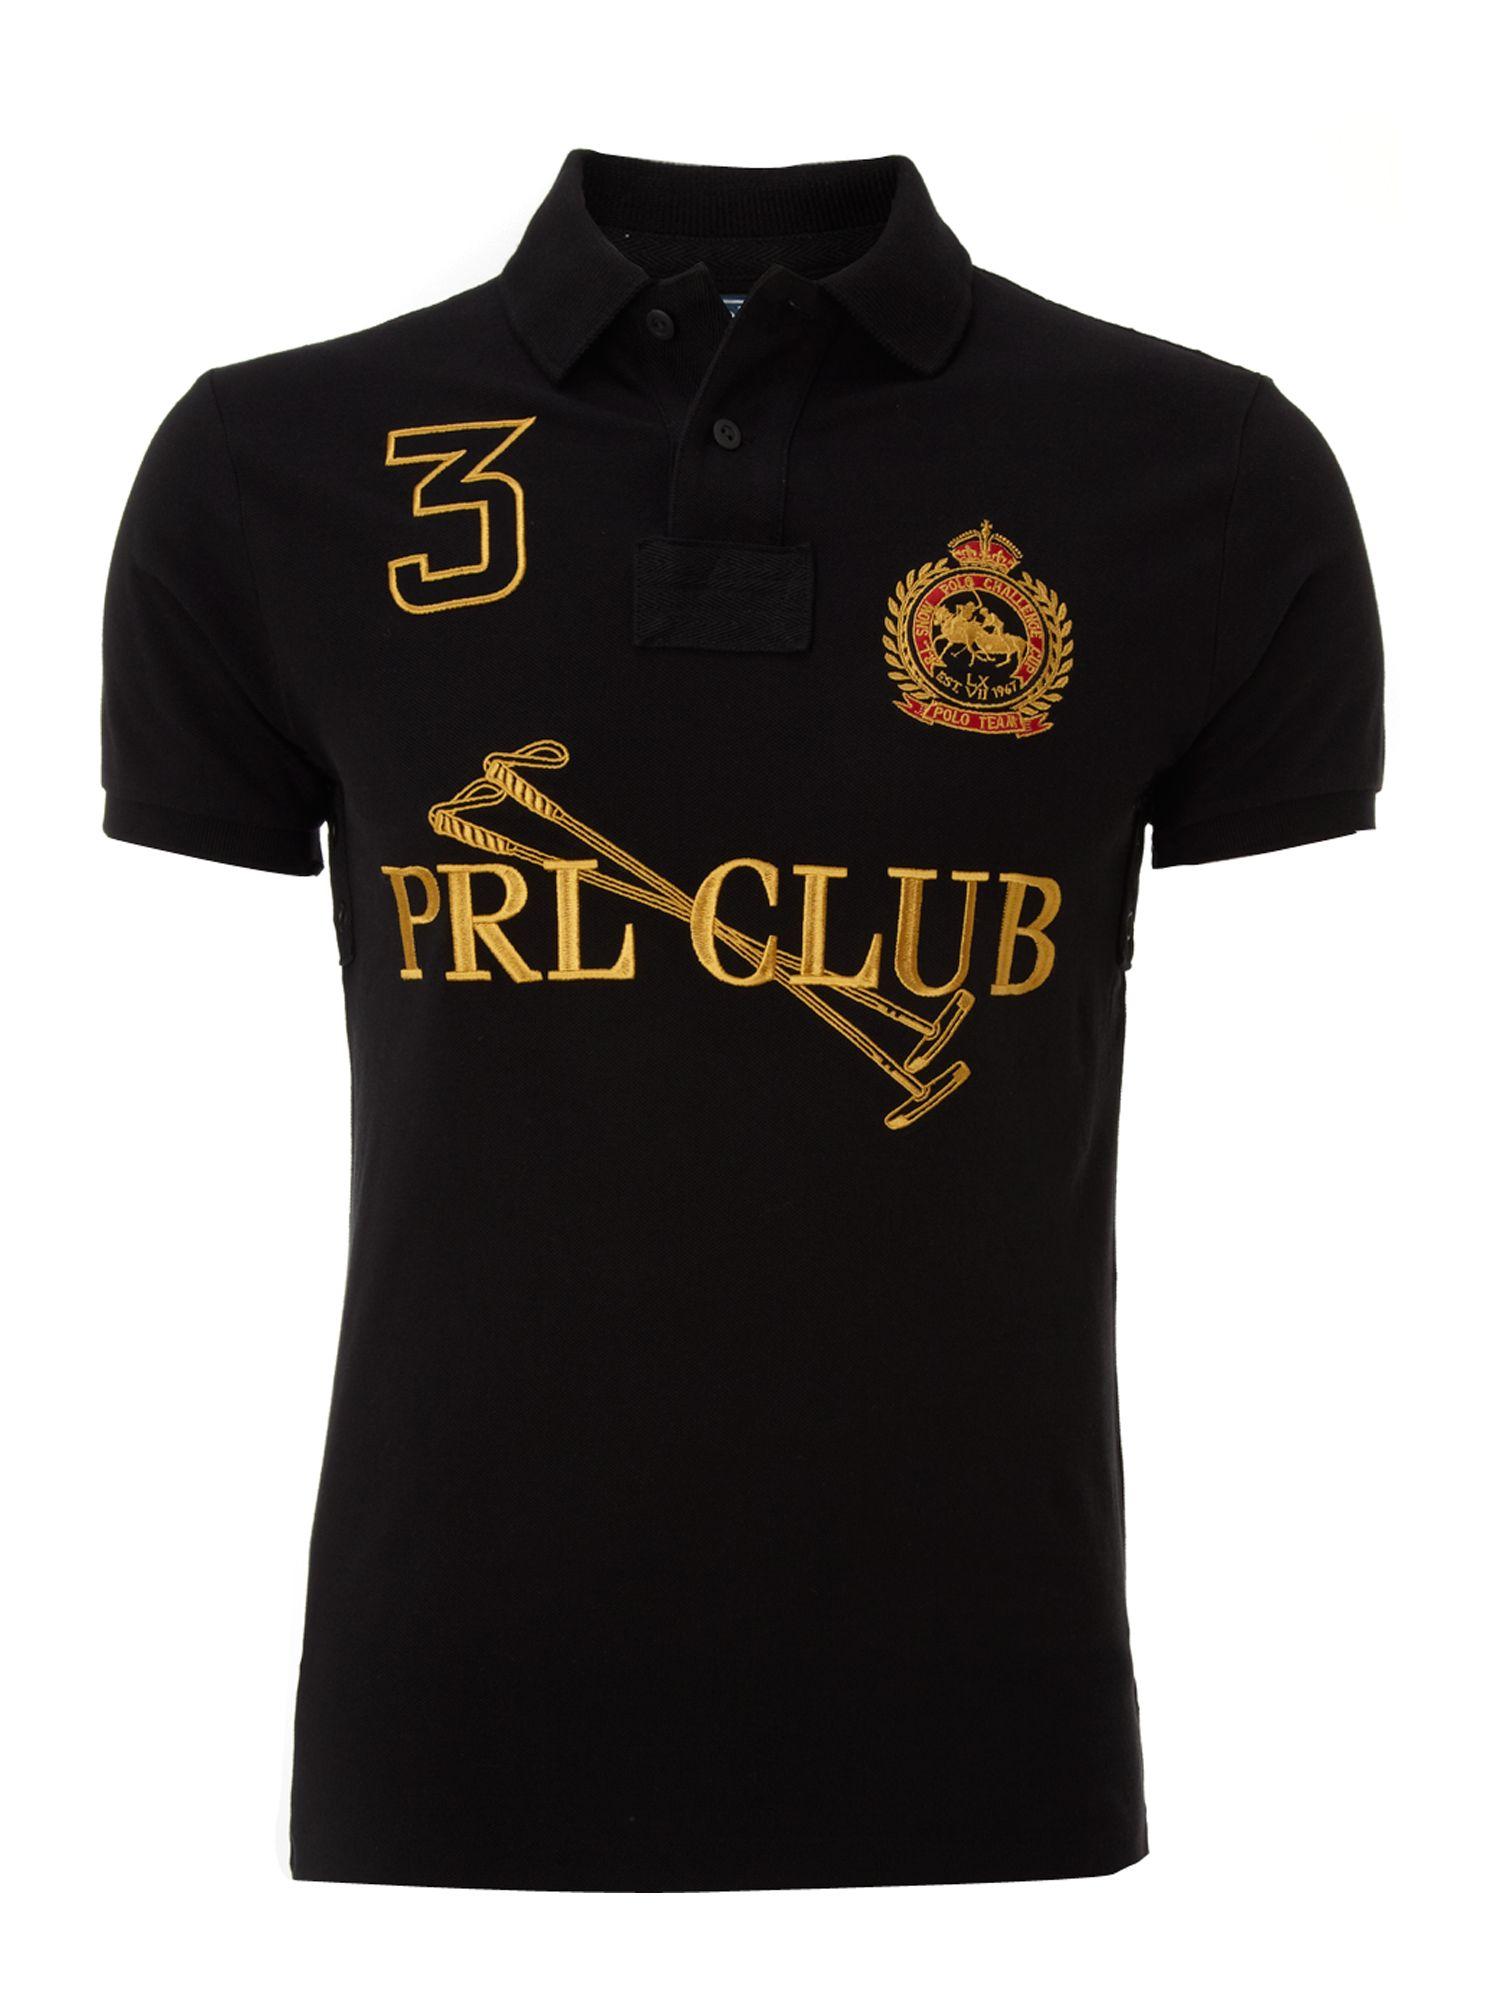 Polo ralph lauren club polo shirt in black for men lyst for Ralph lauren polo club shirts